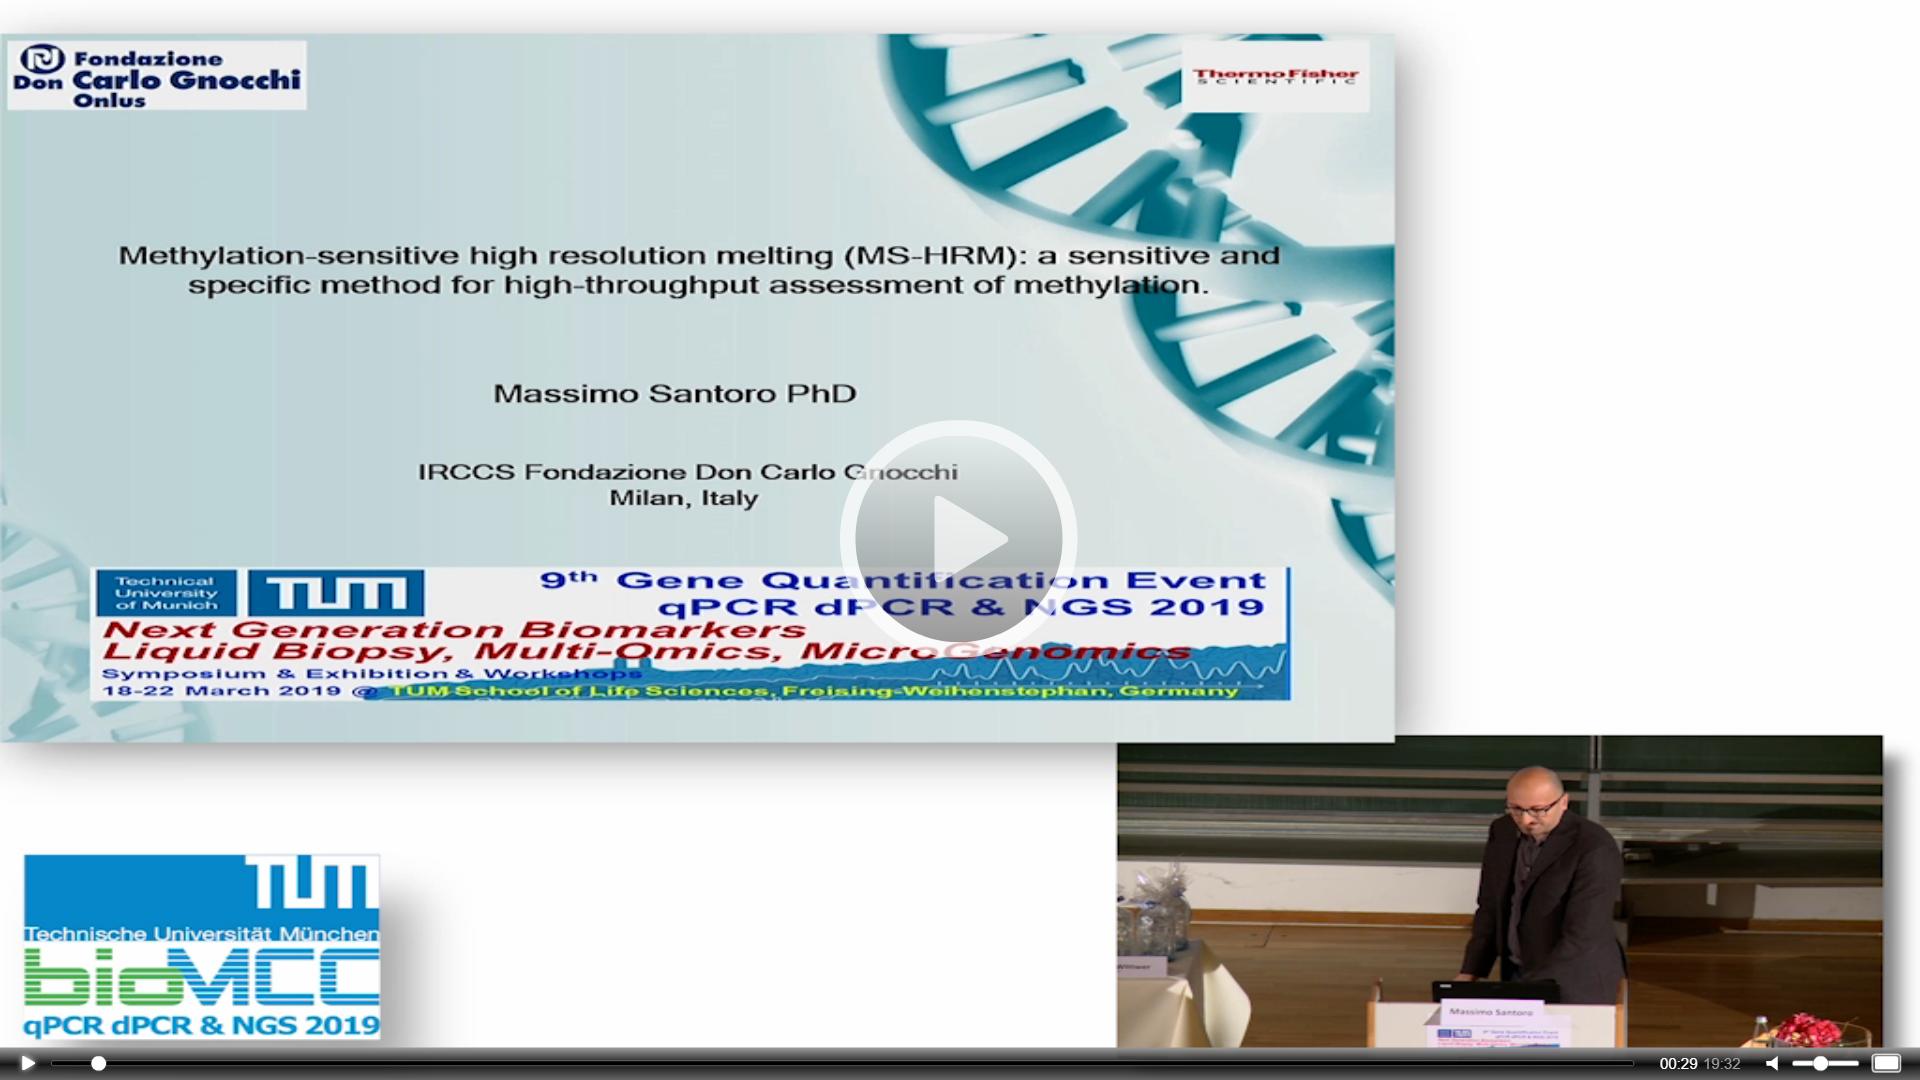 Methylation Sensitive High Resolution Melting; A Sensitive And Specific Method For High-Throughput Assessment Of Methylation